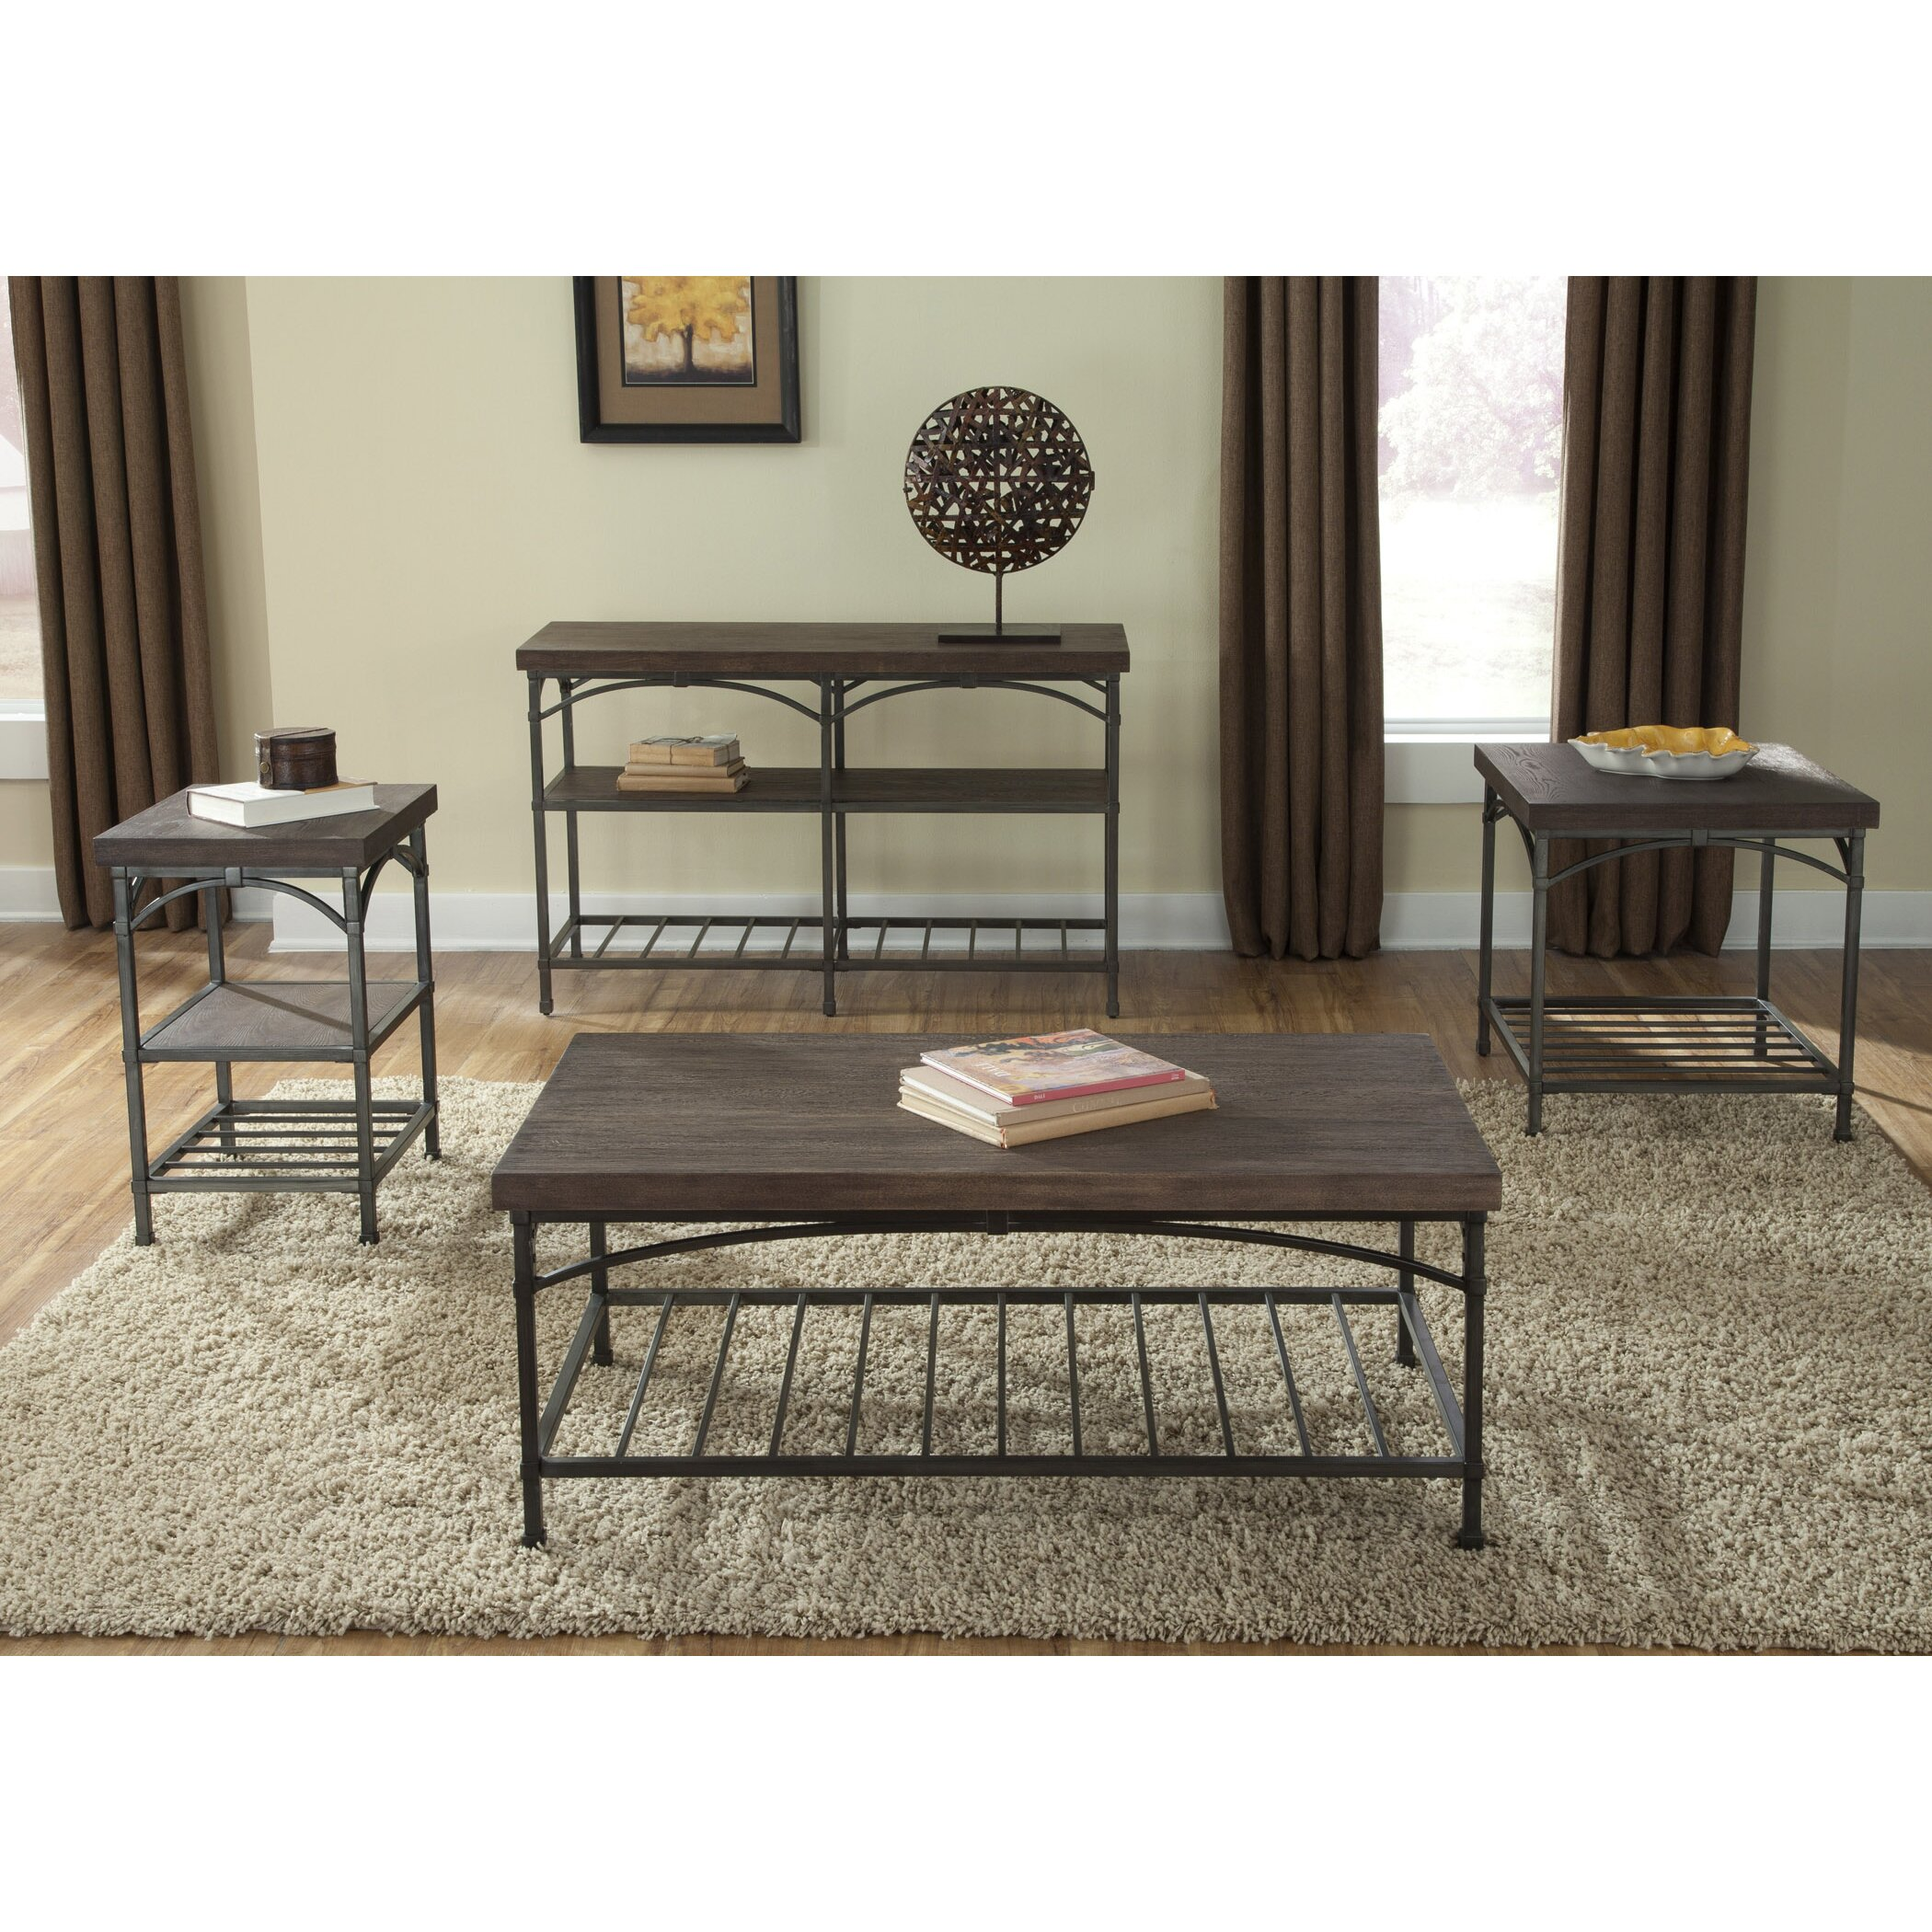 Trent Austin Design Laguna Coffee Table Reviews: Trent Austin Design Franklin Coffee Table & Reviews